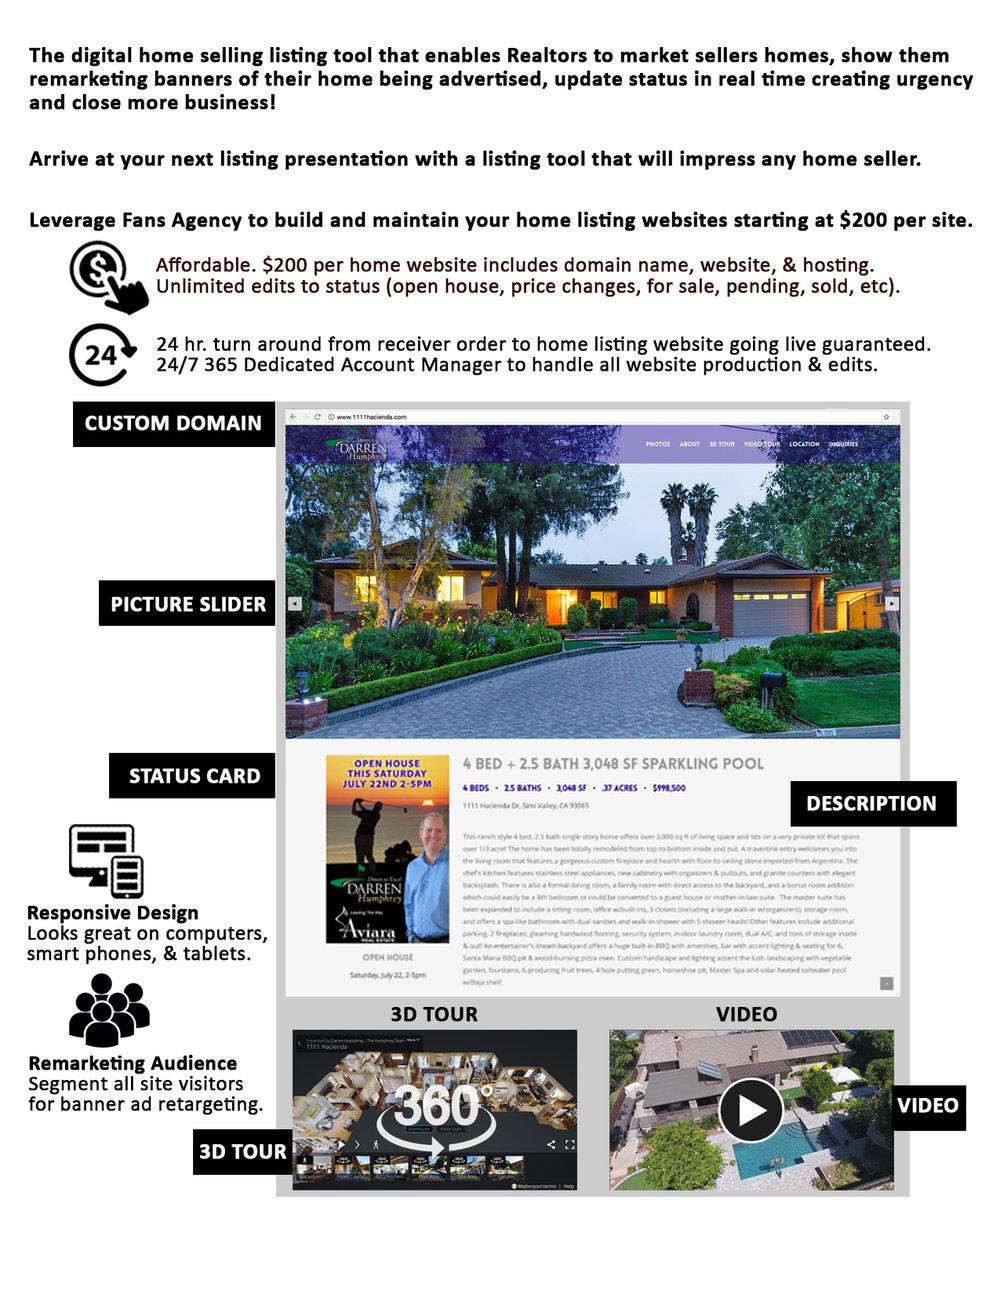 FansAgency.DigitalMarketing.RealEstate.HomeWebsites.Version1.jpg